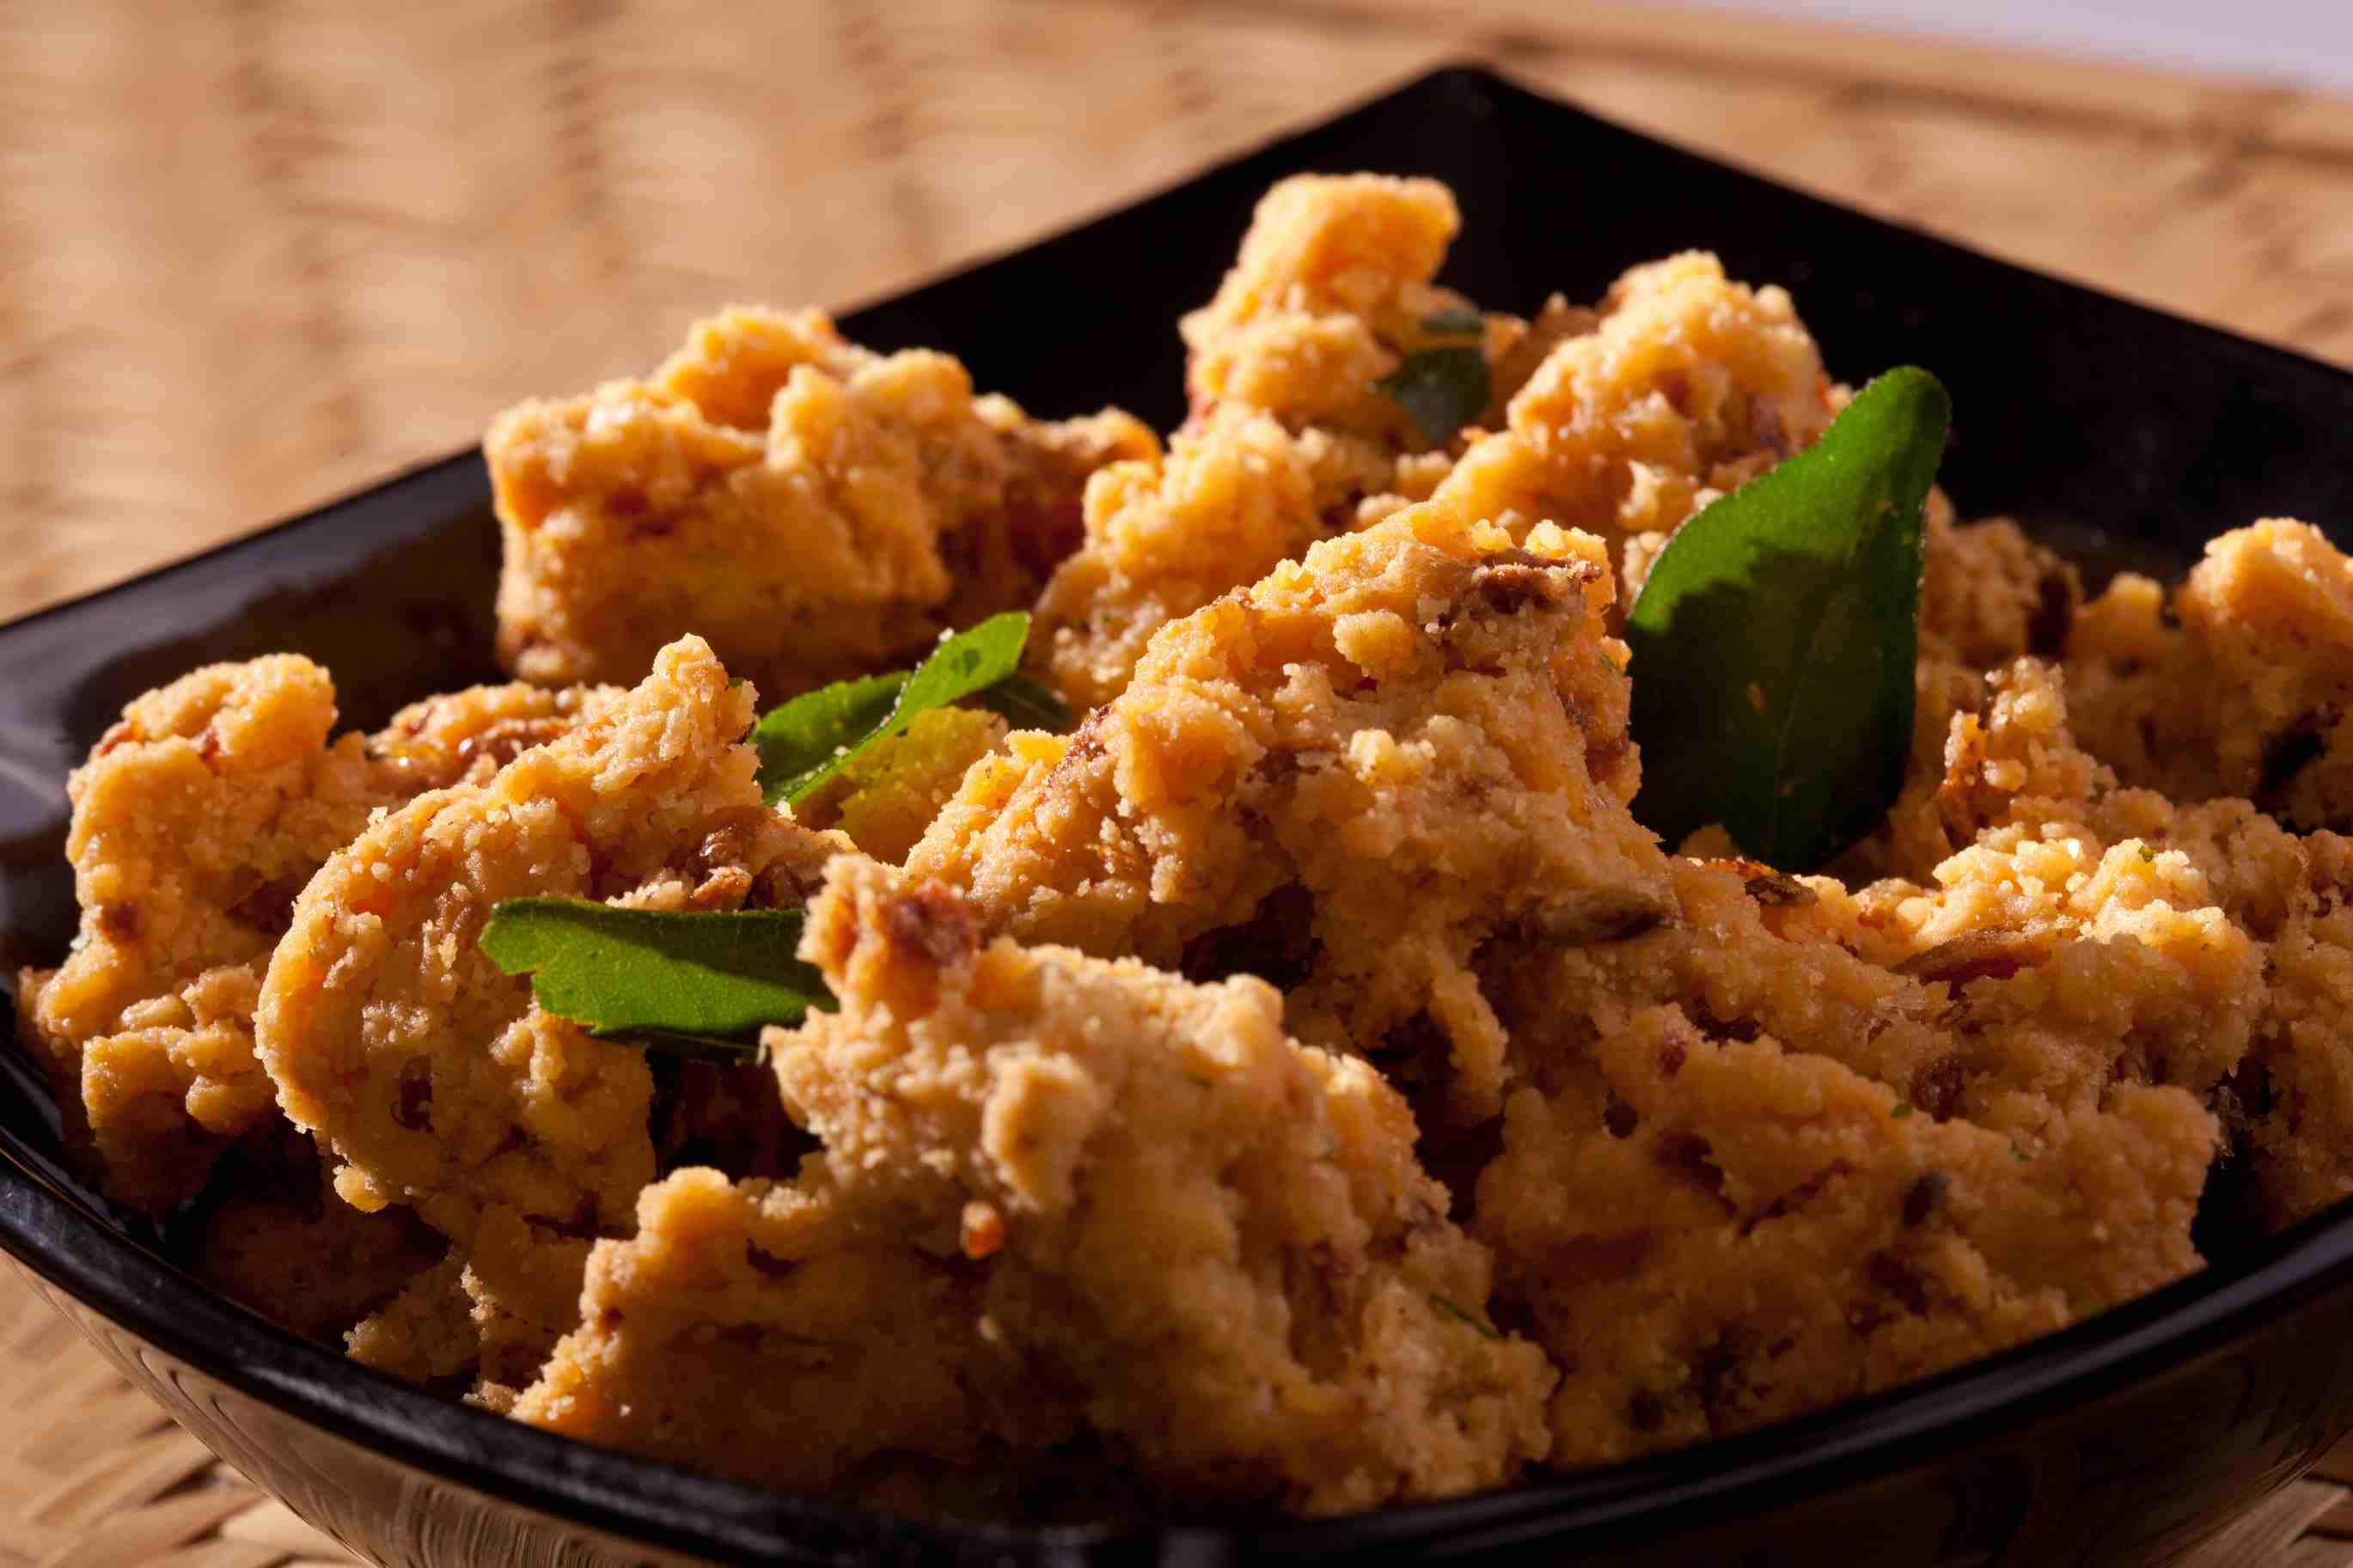 Chicken Pakoras (bhajias) in a serving dish